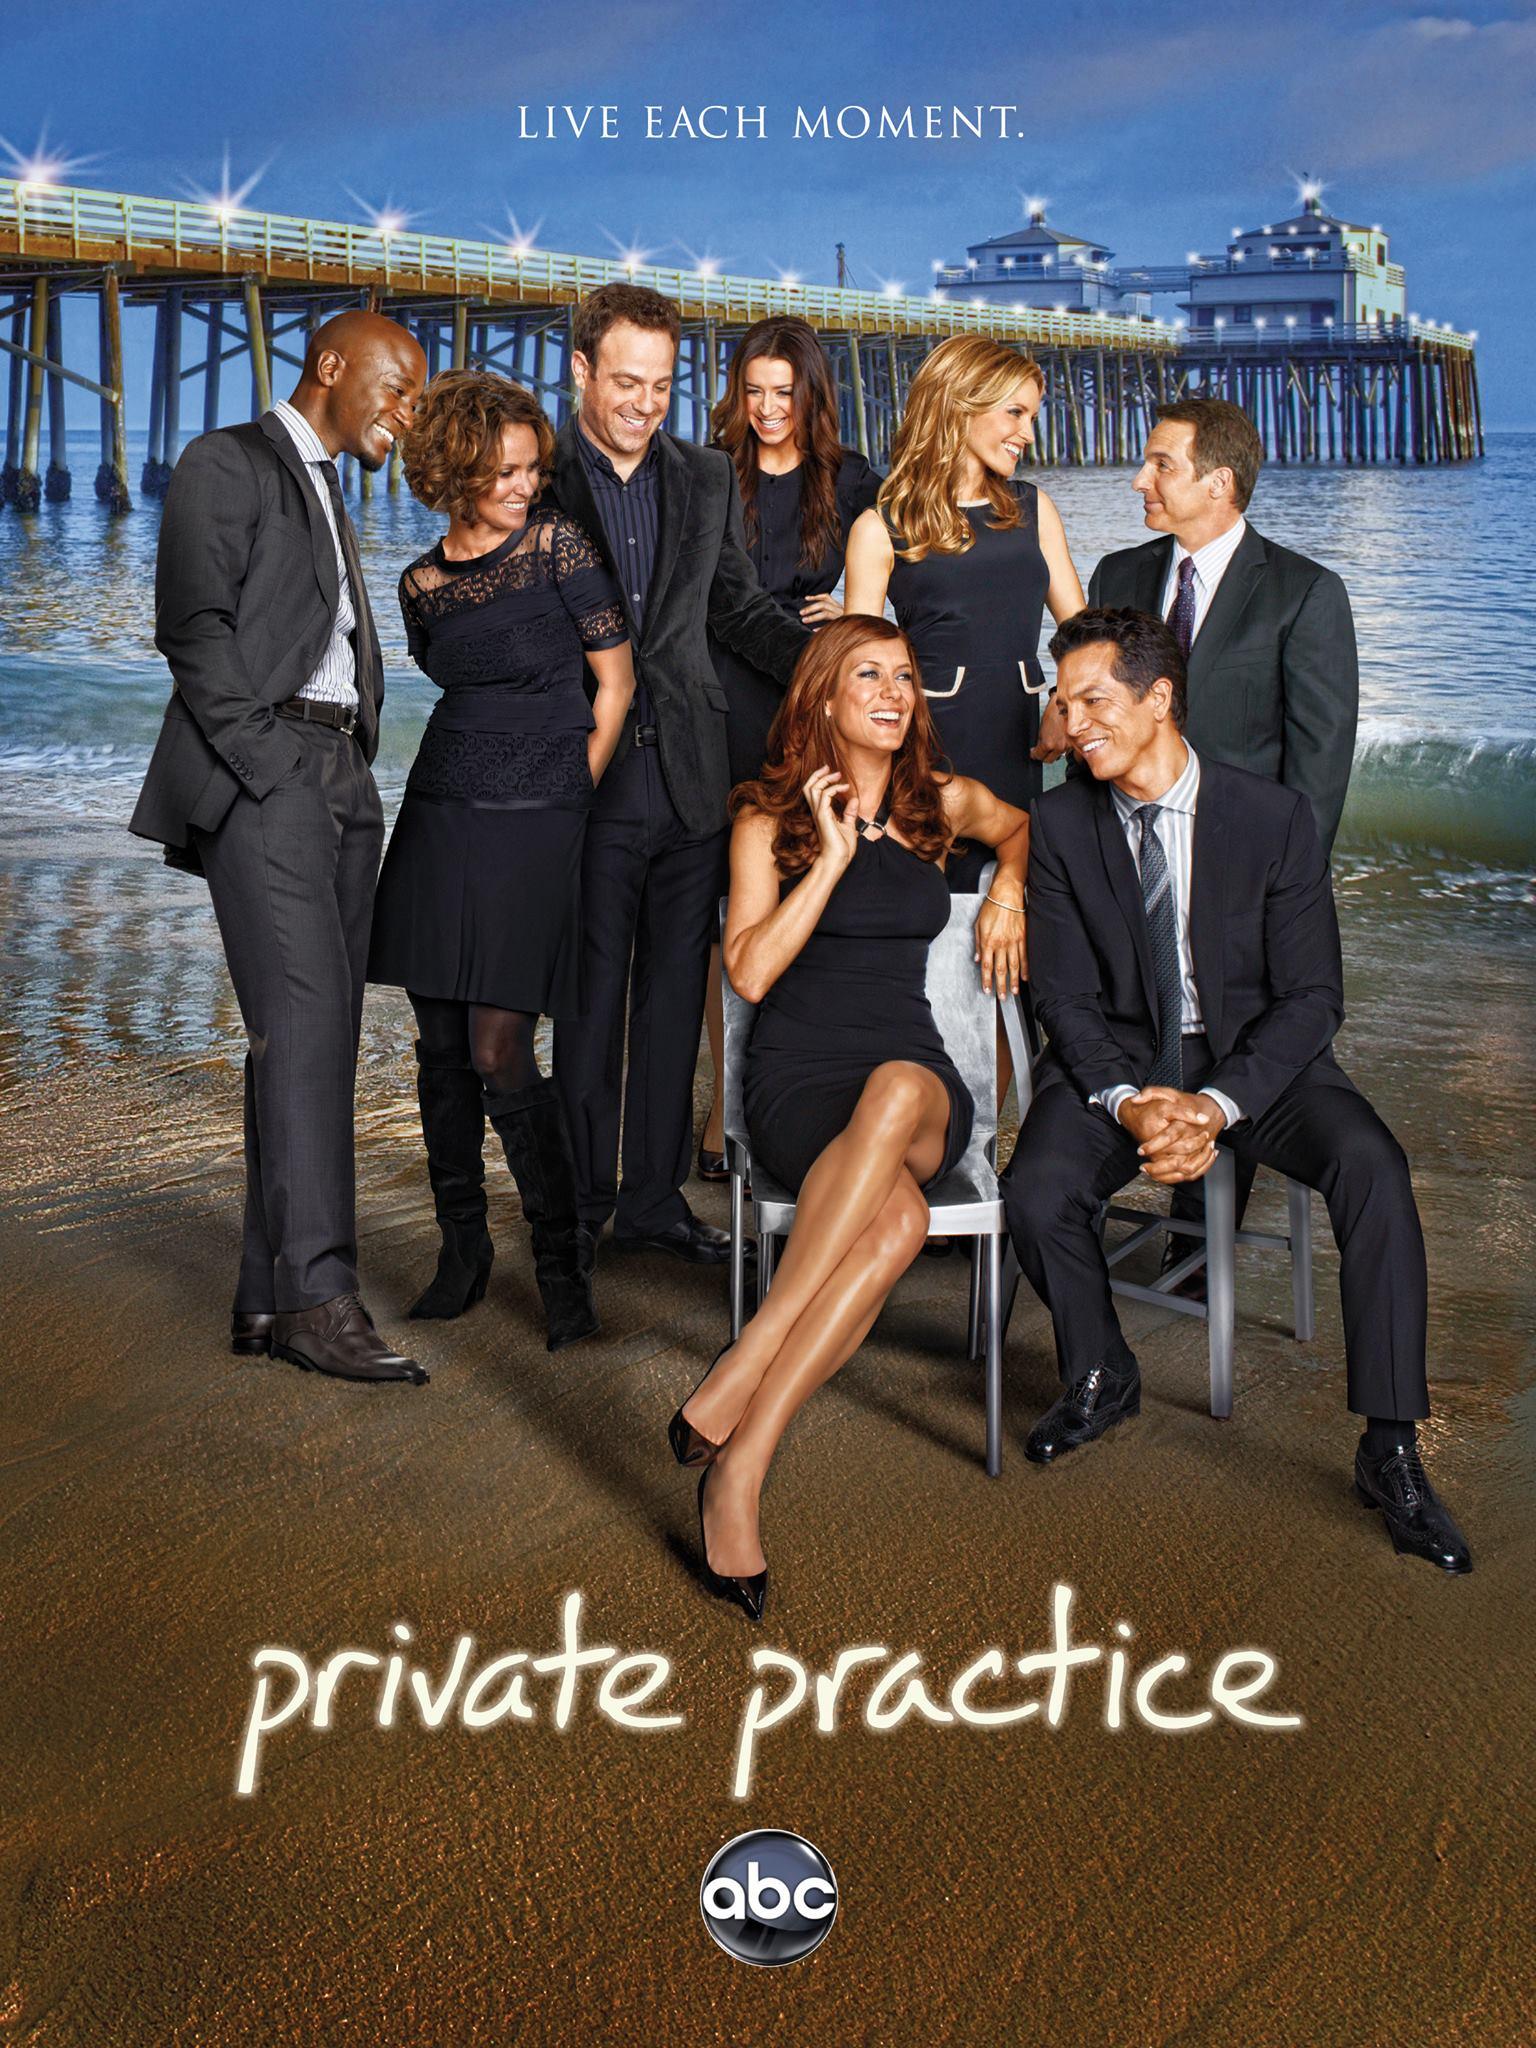 Private Practice Episodes